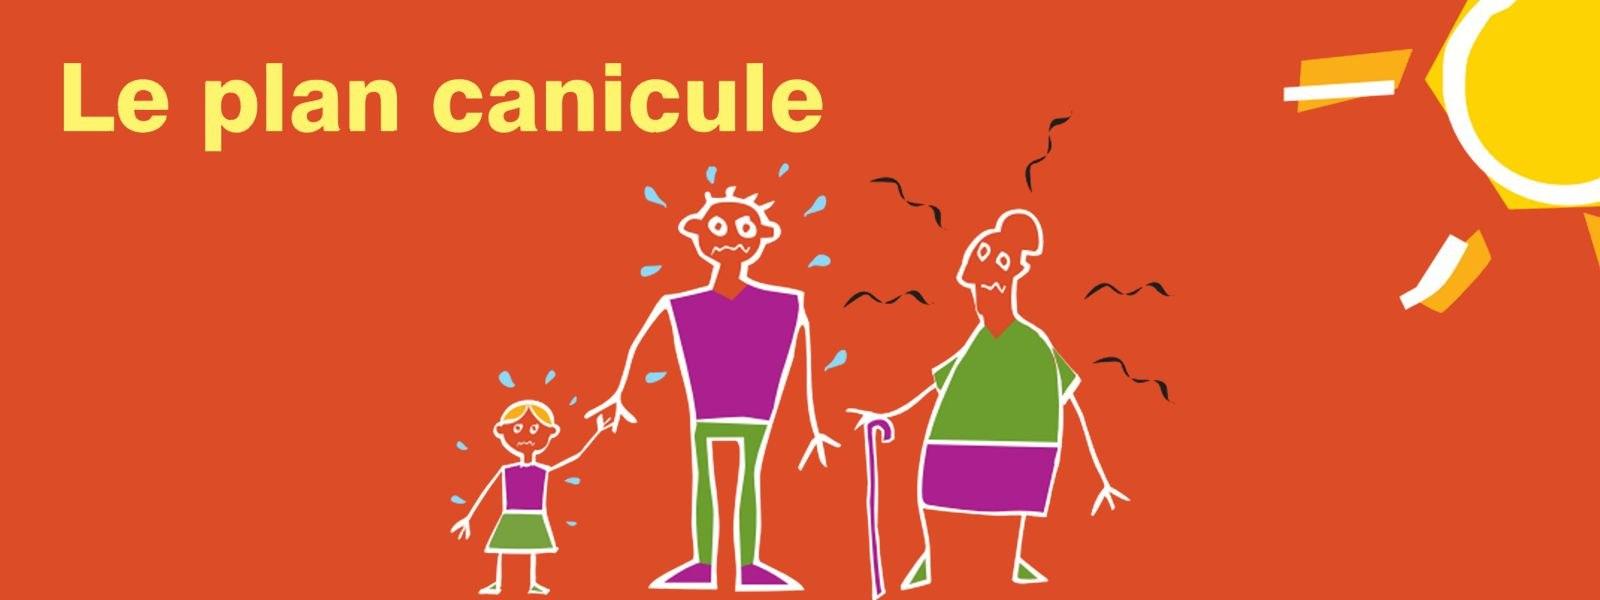 Canicule Senior